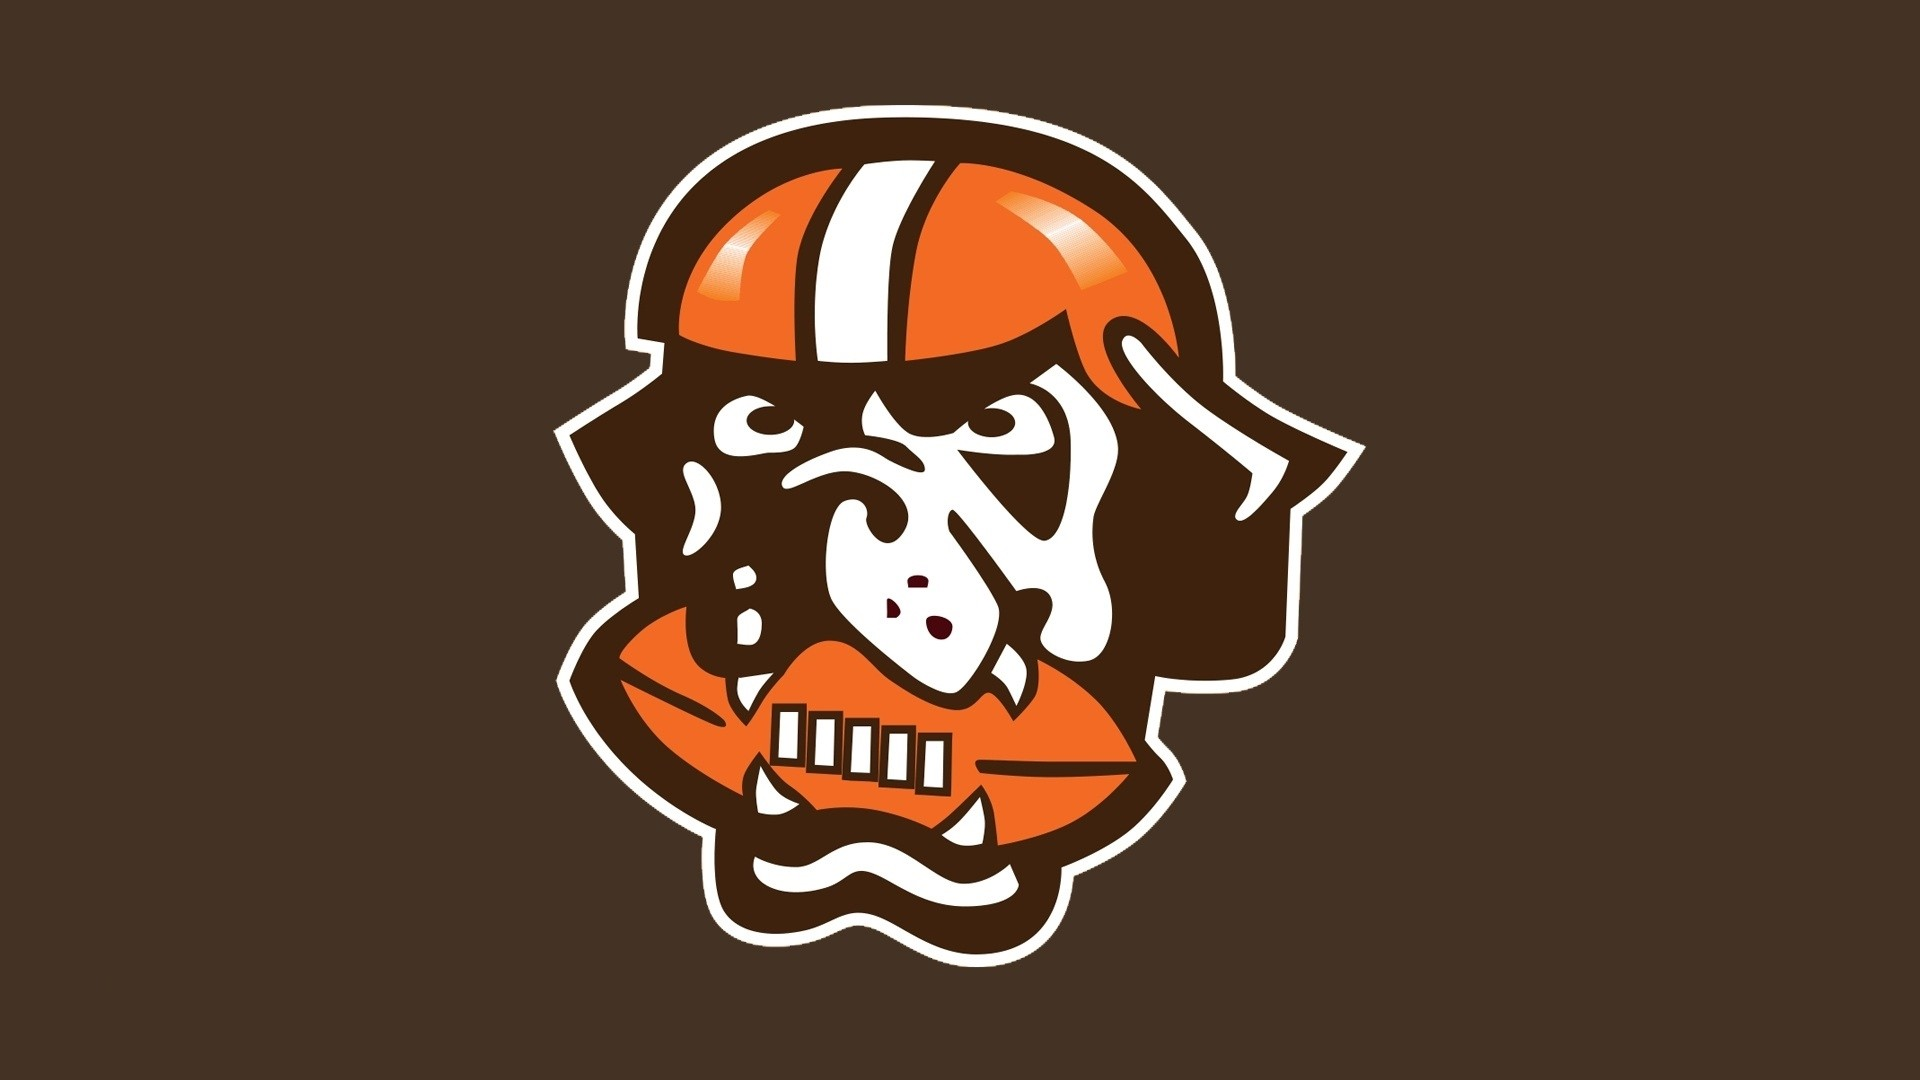 Cleveland Browns Full HD Wallpaper